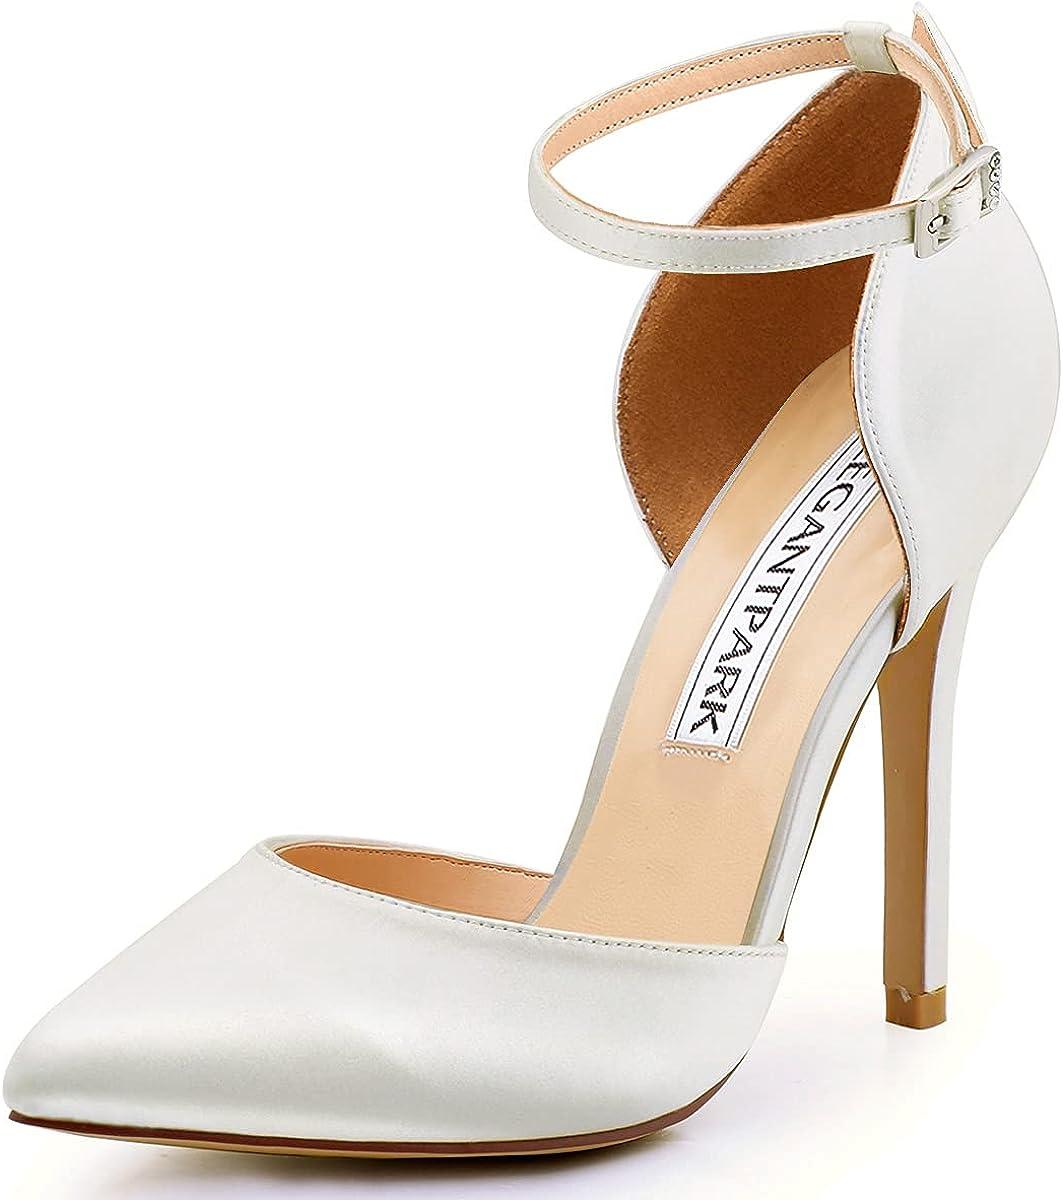 ElegantPark Pointed Toe 年間定番 激安通販 Heels for Wedding Ankle Women Brid Strap